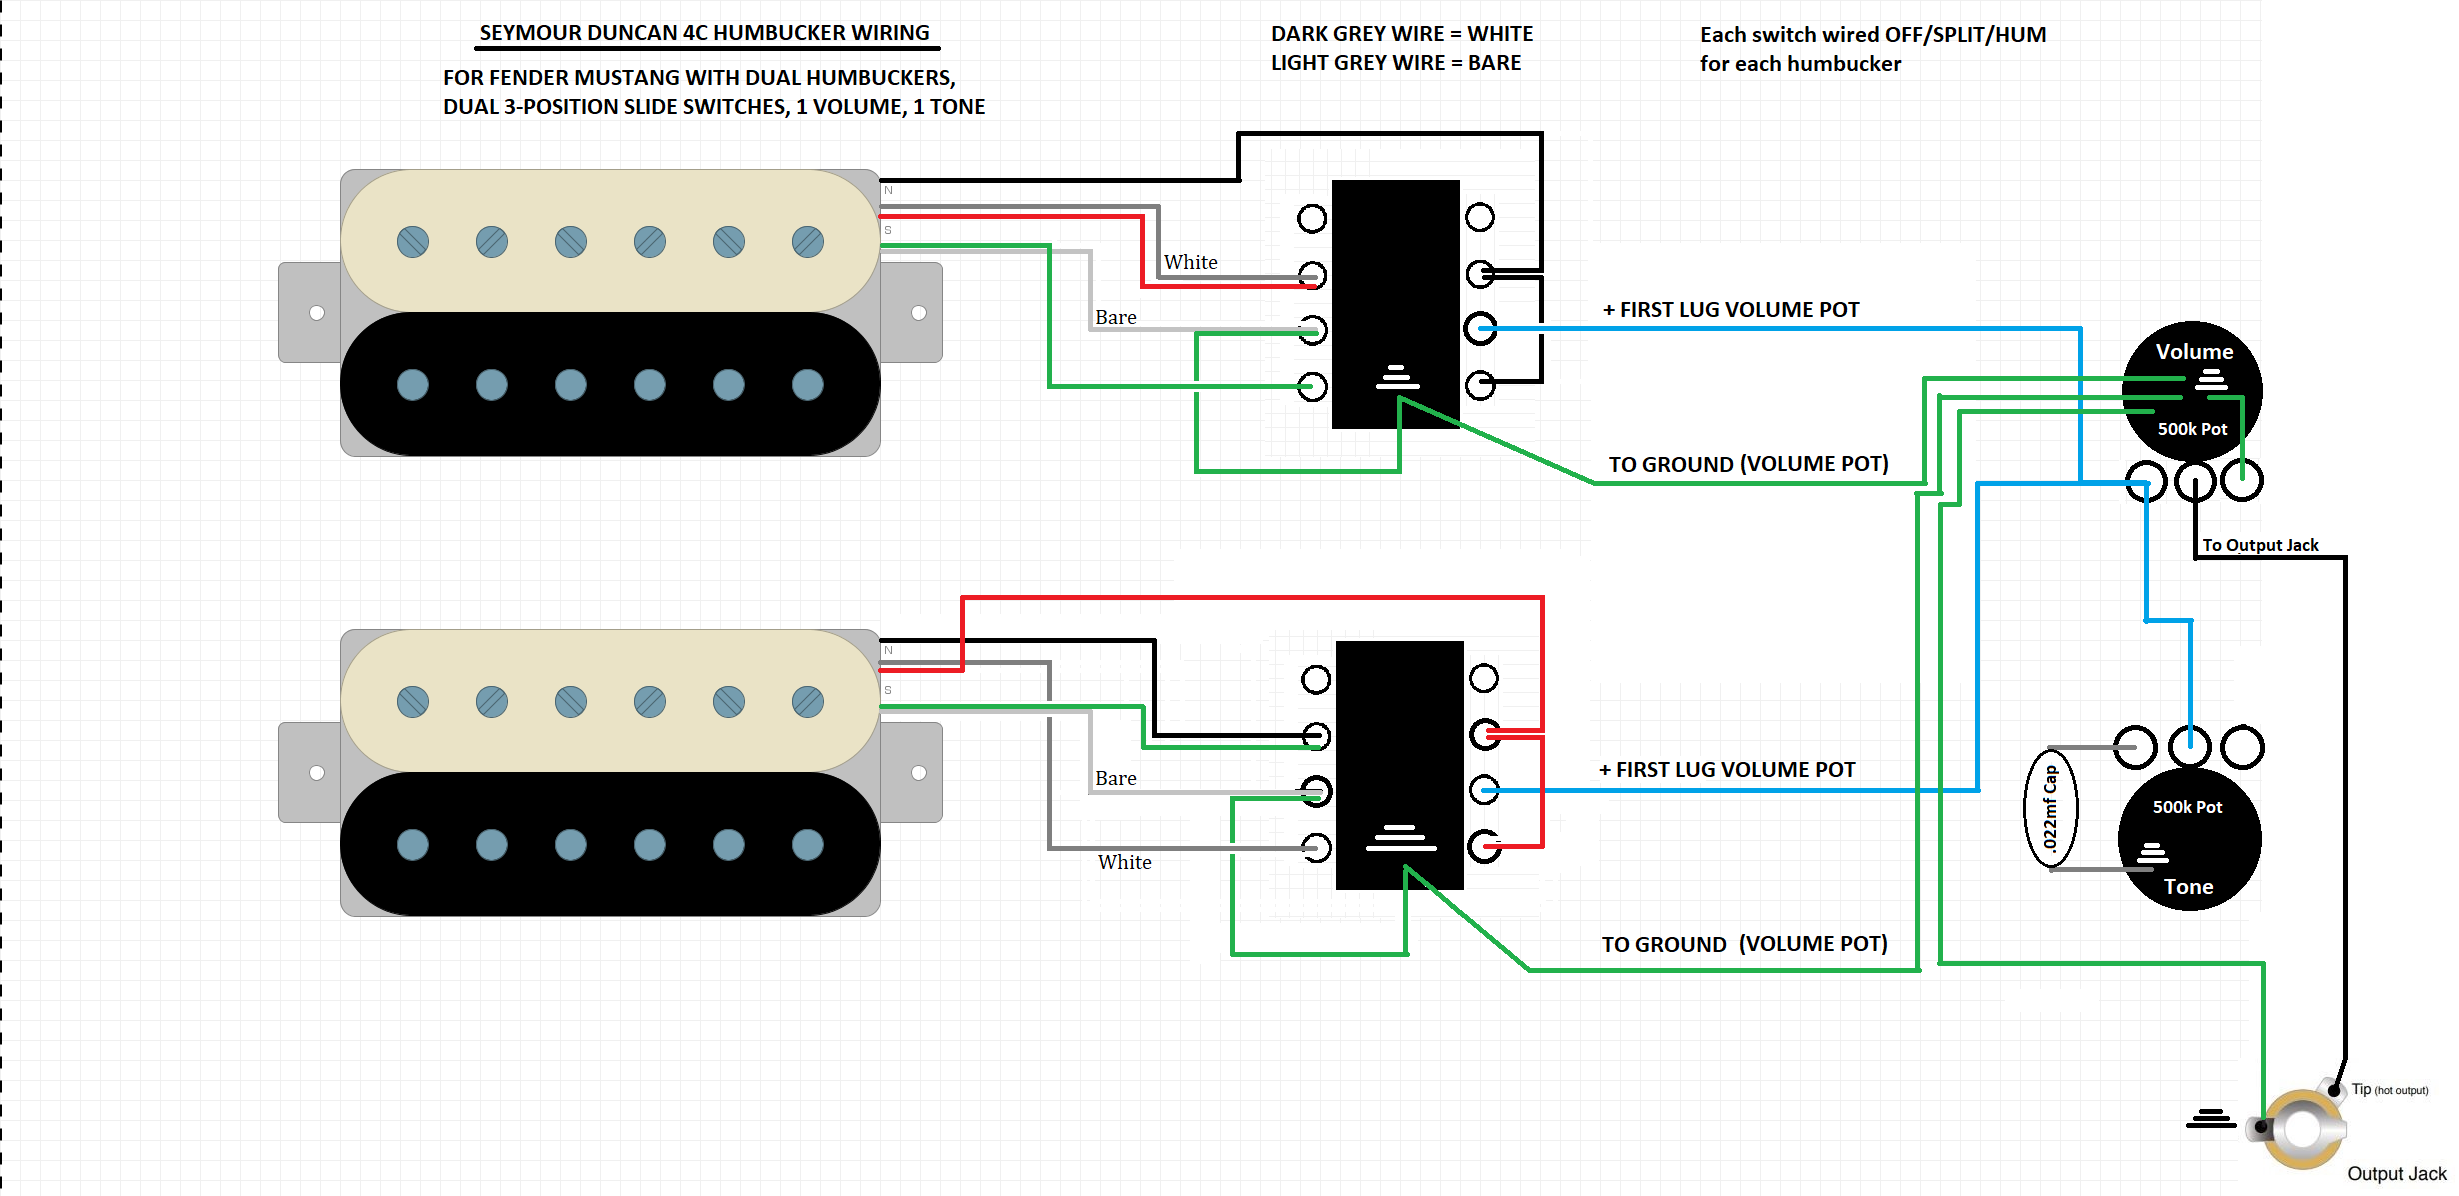 fender mustang wiring diagram - Wiring Diagram